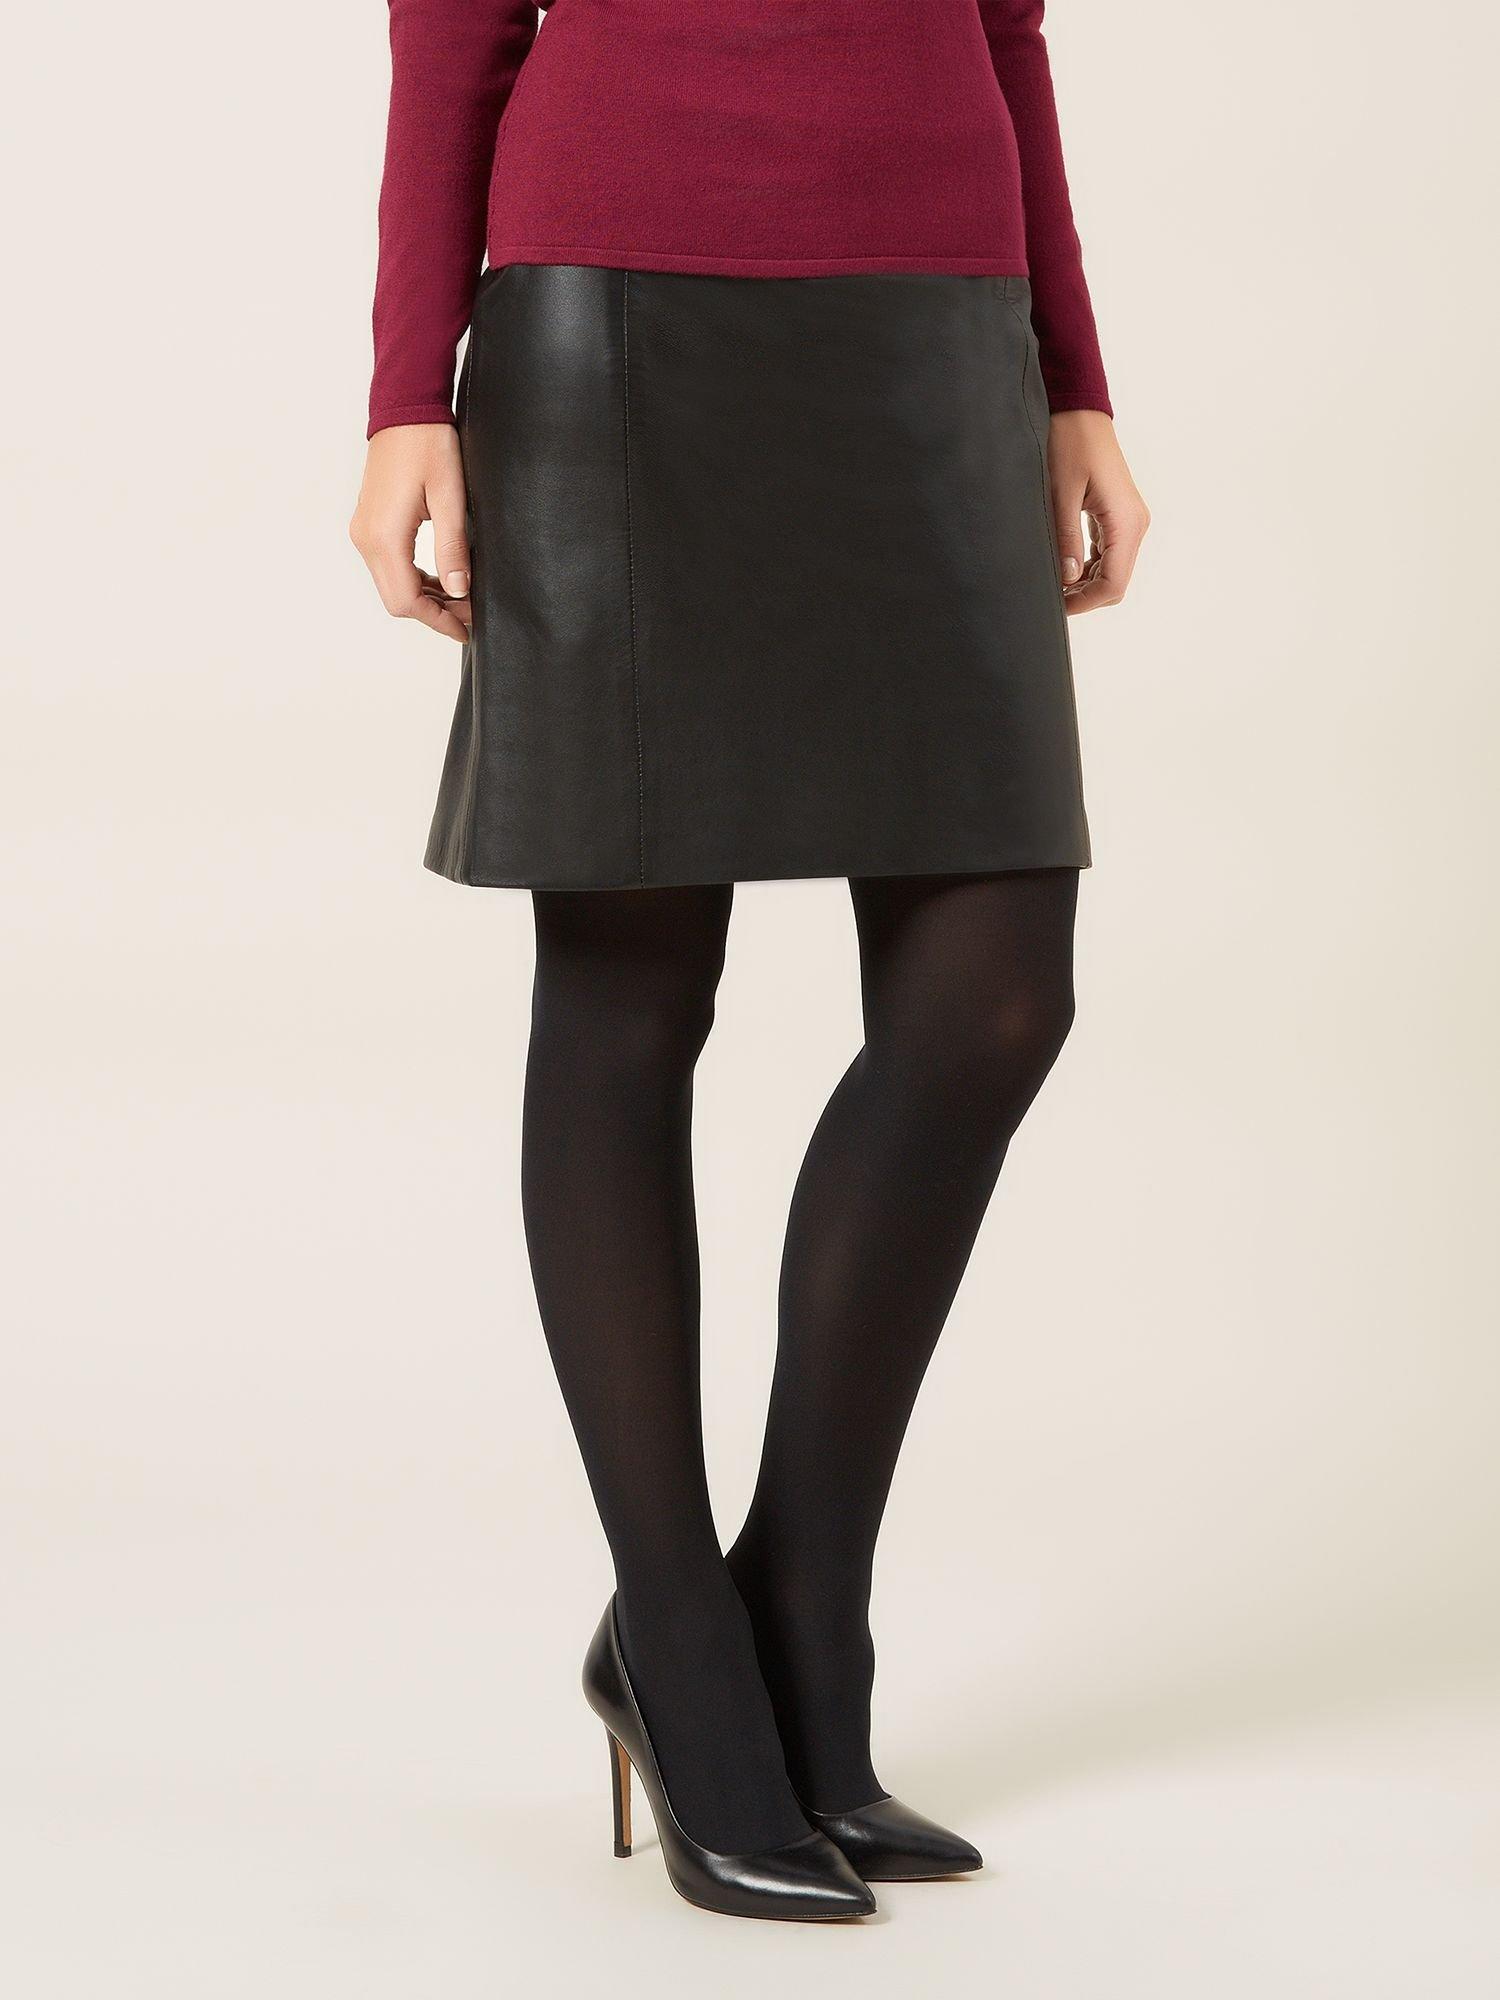 Petite Black Leather Skirt   Jill Dress